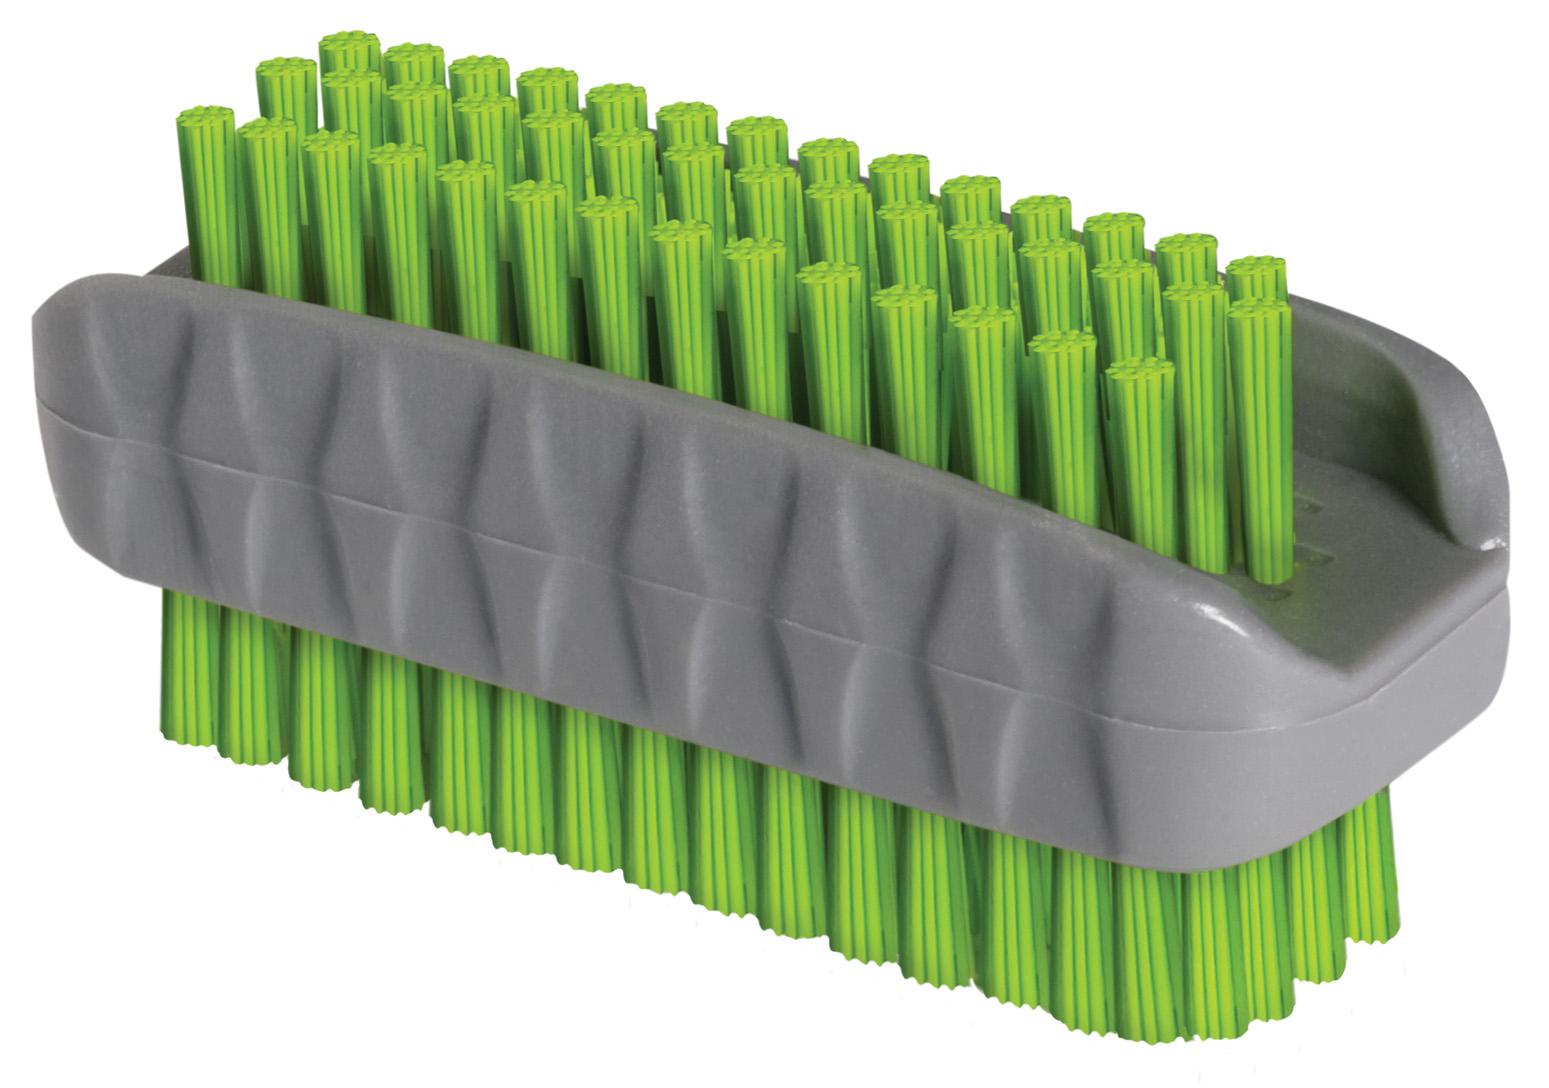 02344 - Nagelbürste, Kunststoff, 2-seitig, 8x2,5cm